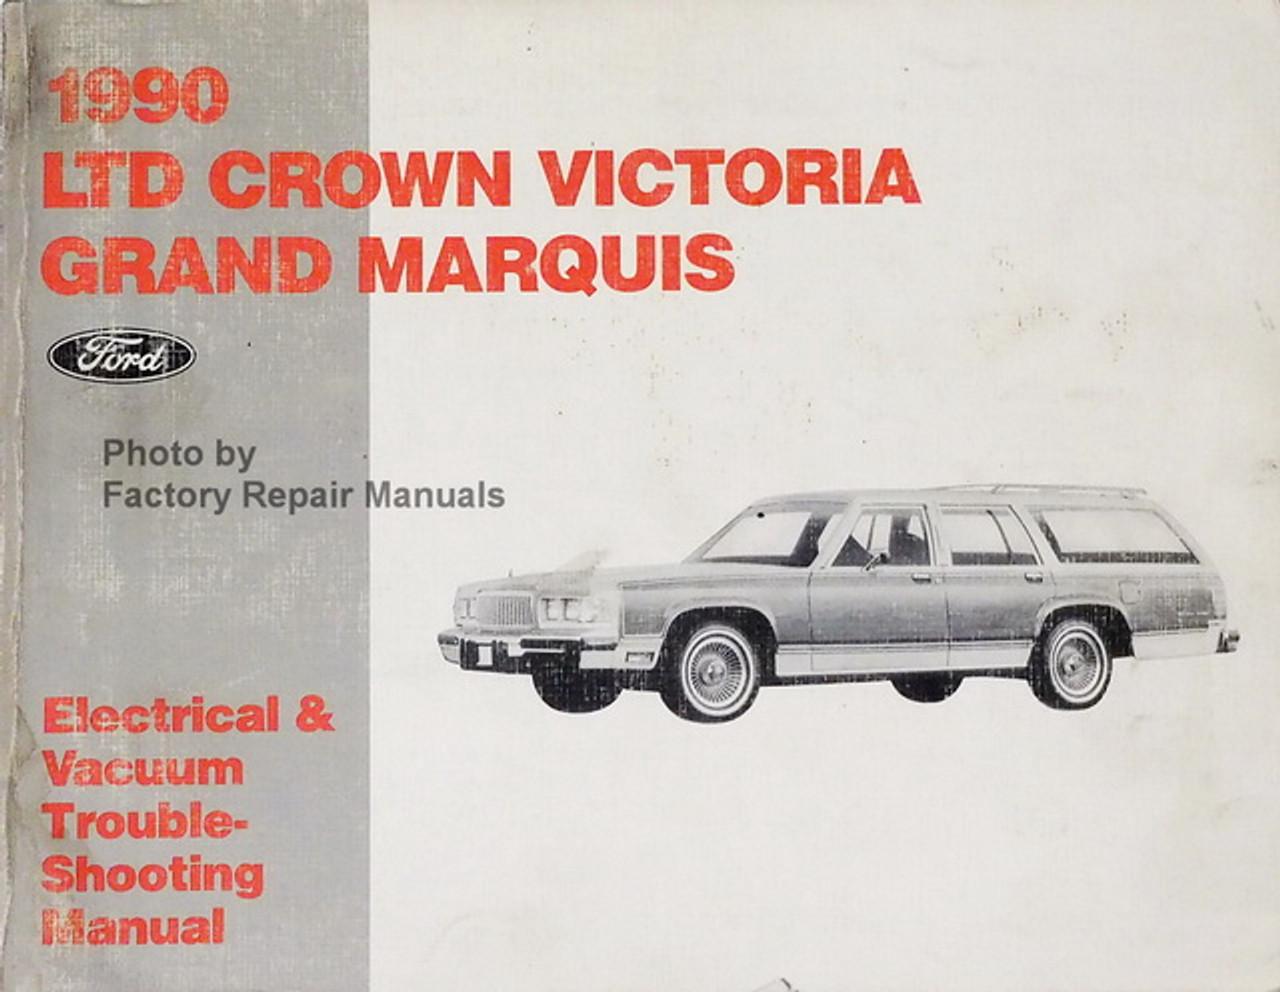 1990 mercury grand marquis wiring diagram 1990 ford crown victoria   mercury grand marquis electrical vacuum  crown victoria   mercury grand marquis